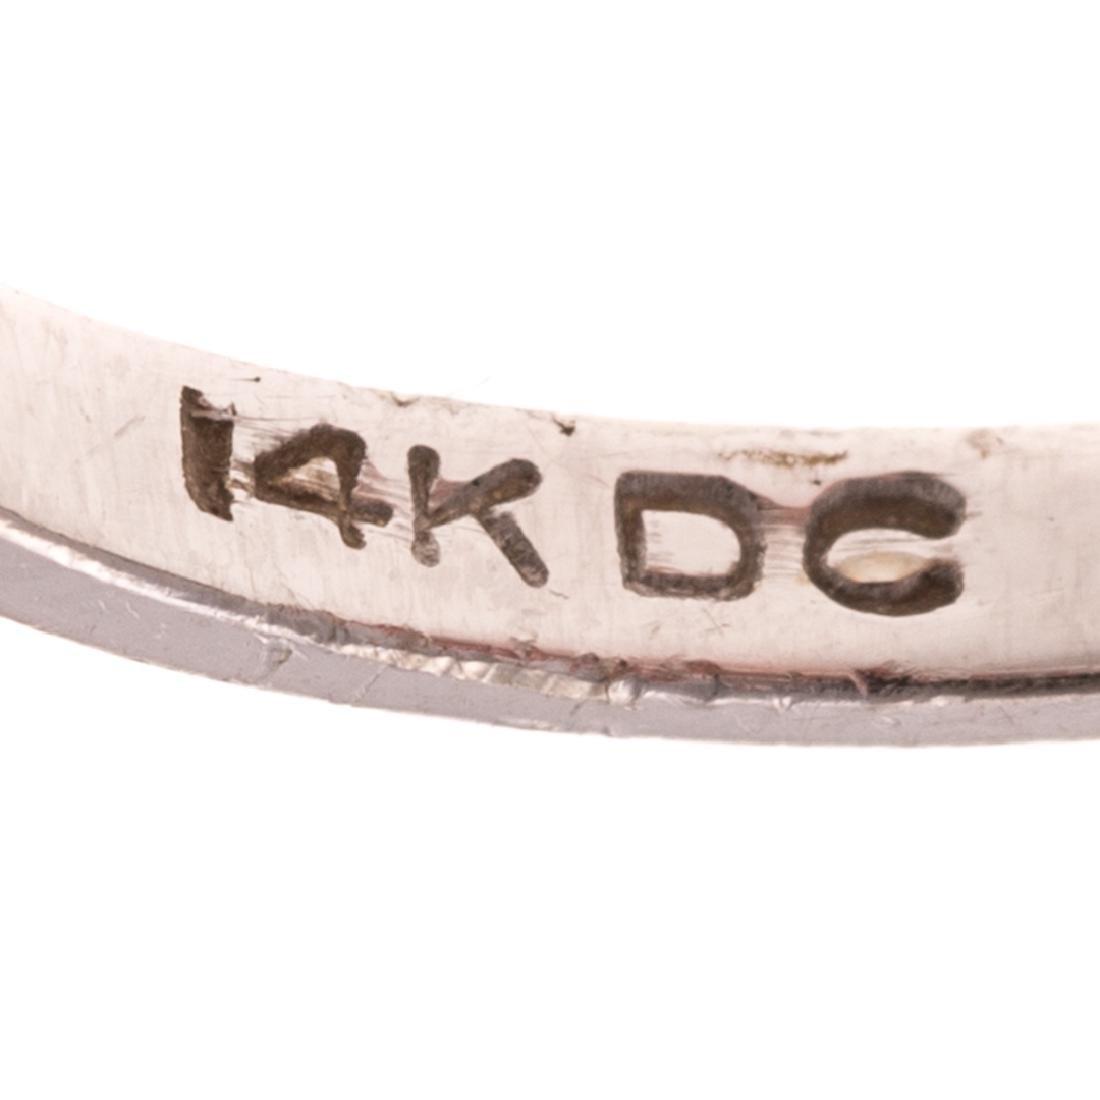 A Lady's White Gold Diamond Bracelet & Ring - 7